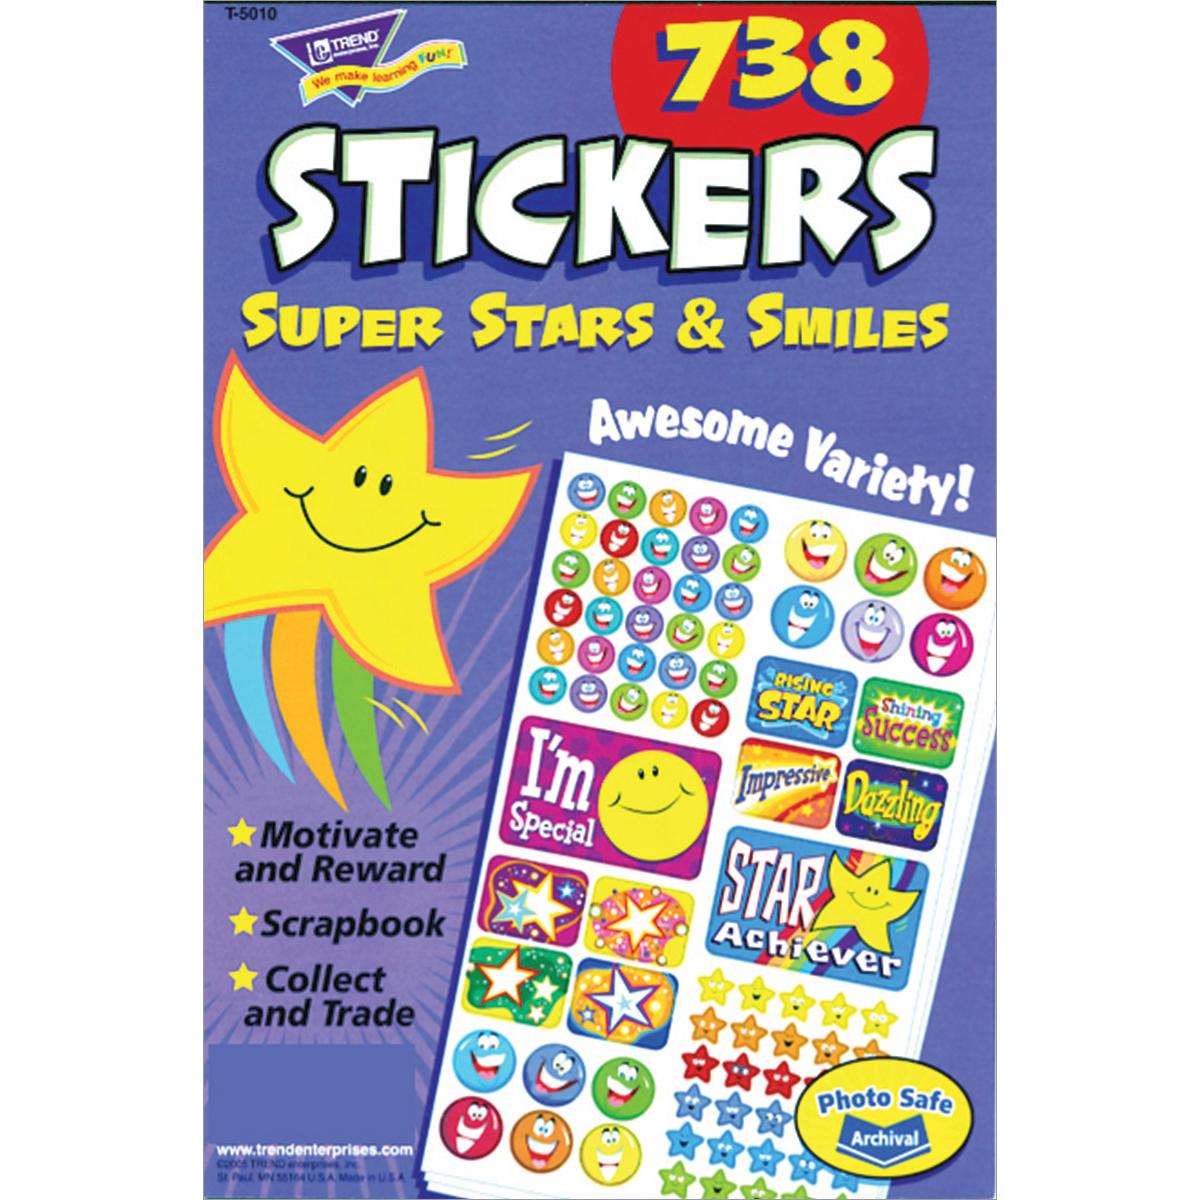 Super Stars & Smiles Sticker Book